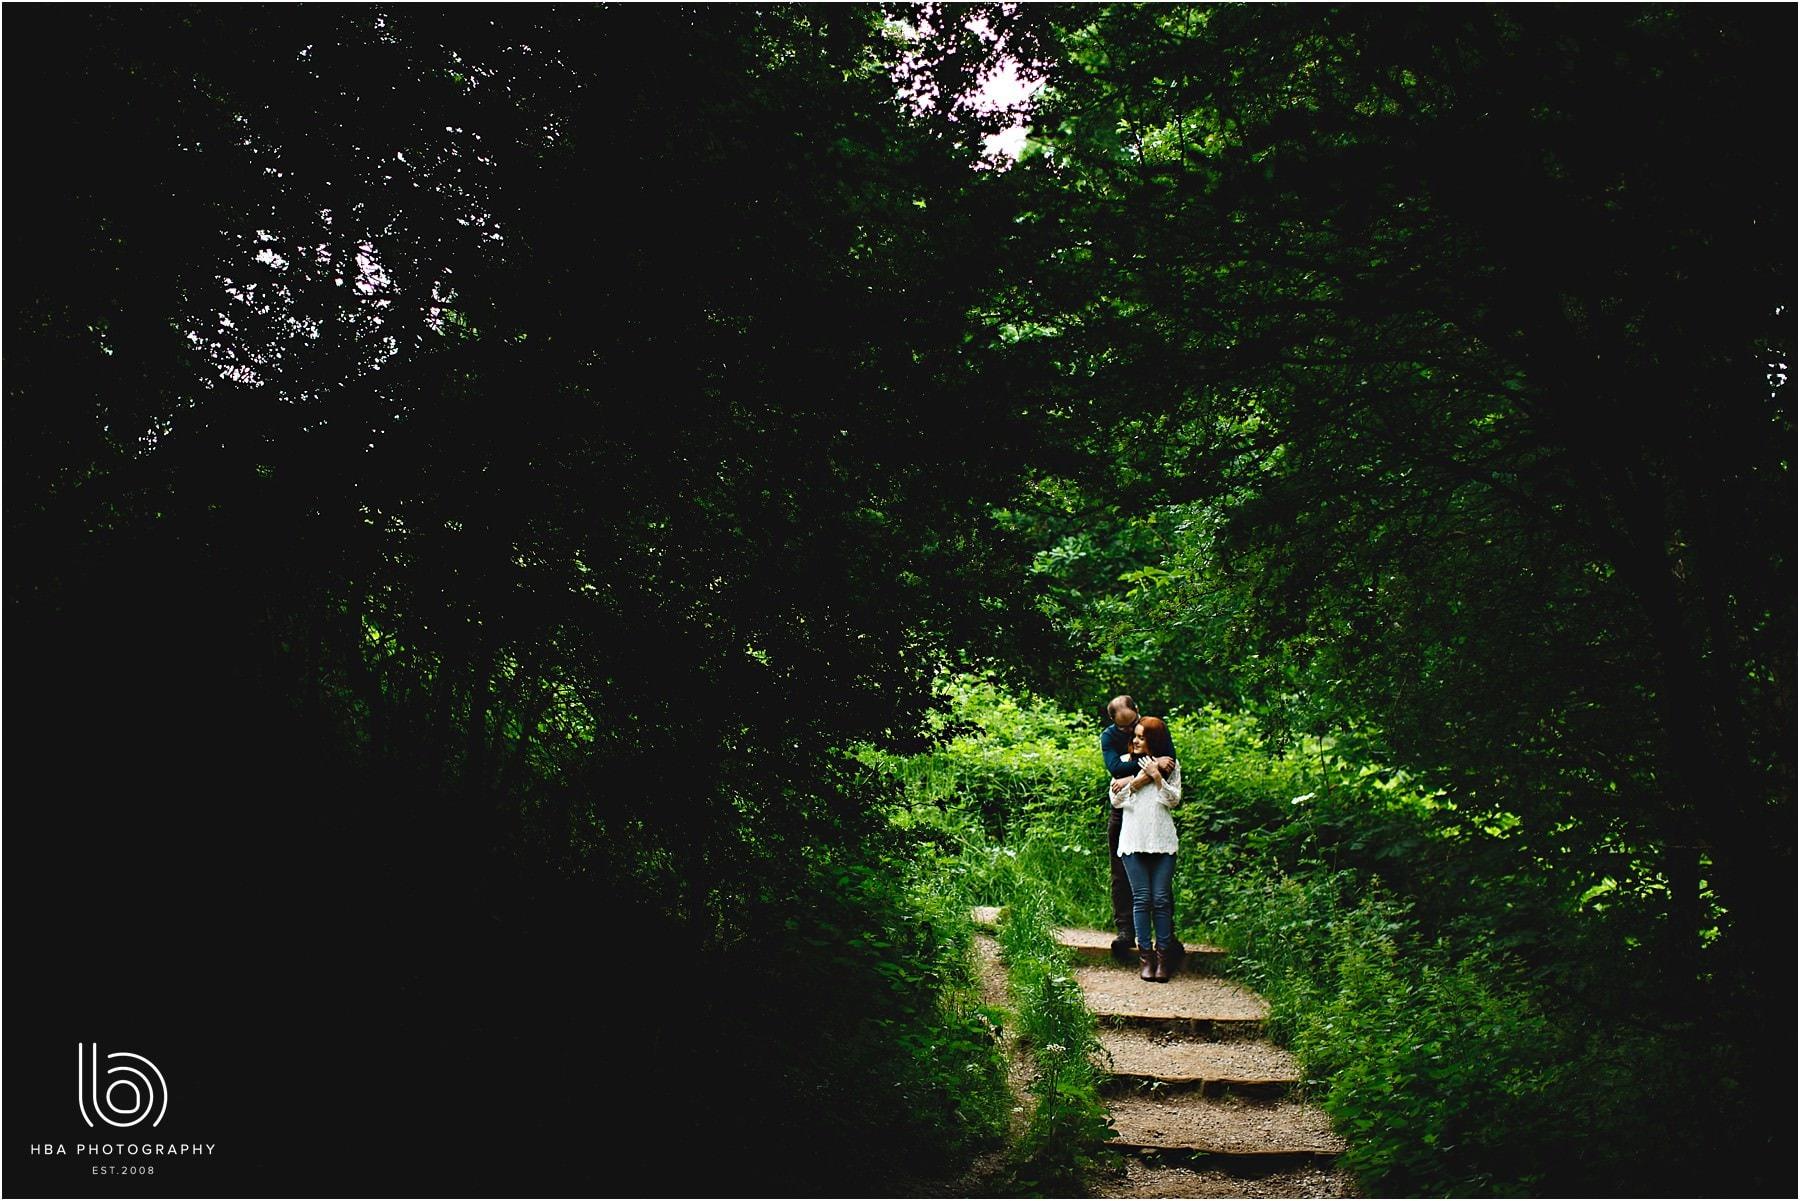 Calke_Abbey_engagement_photos_0019